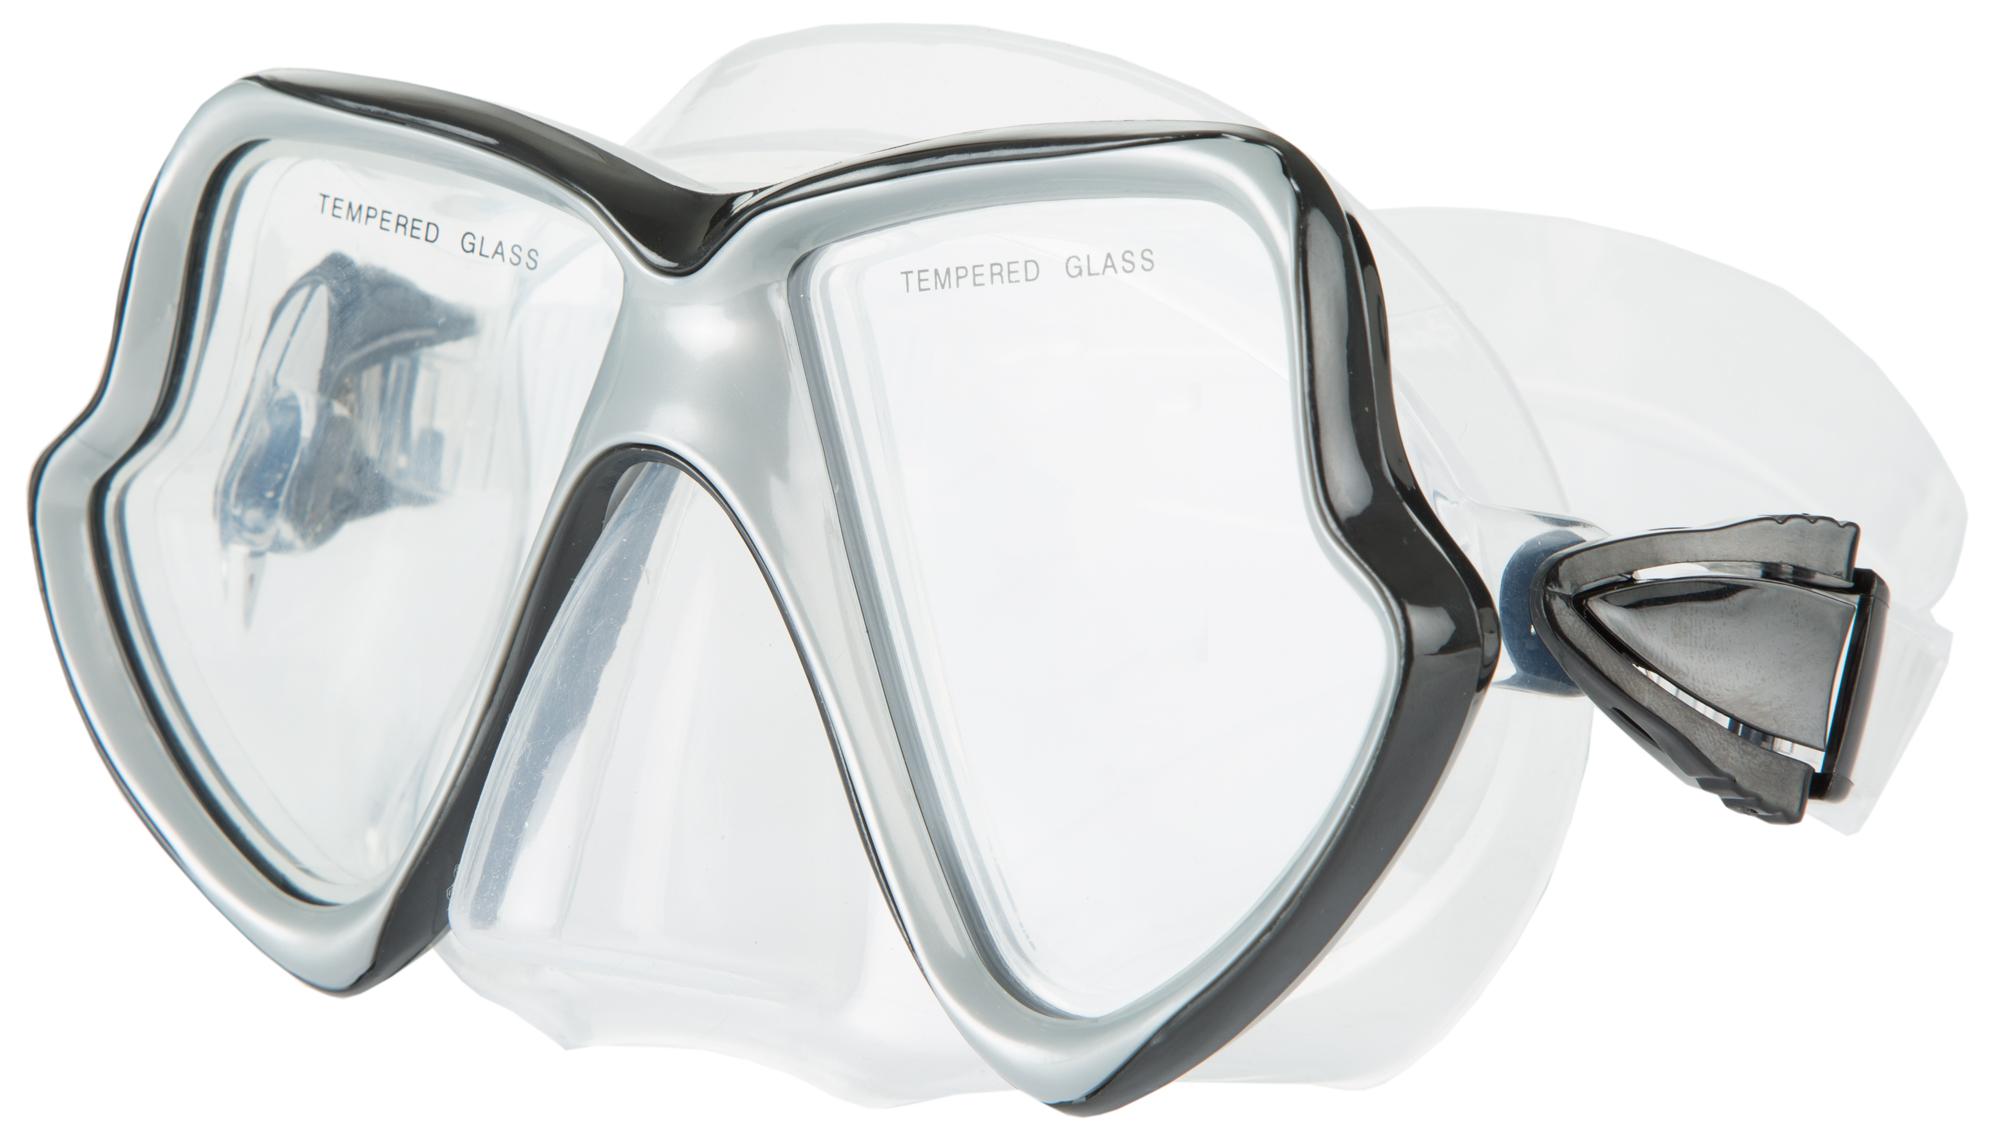 Joss Маска для плавания Joss где купить маску для подводного плавания